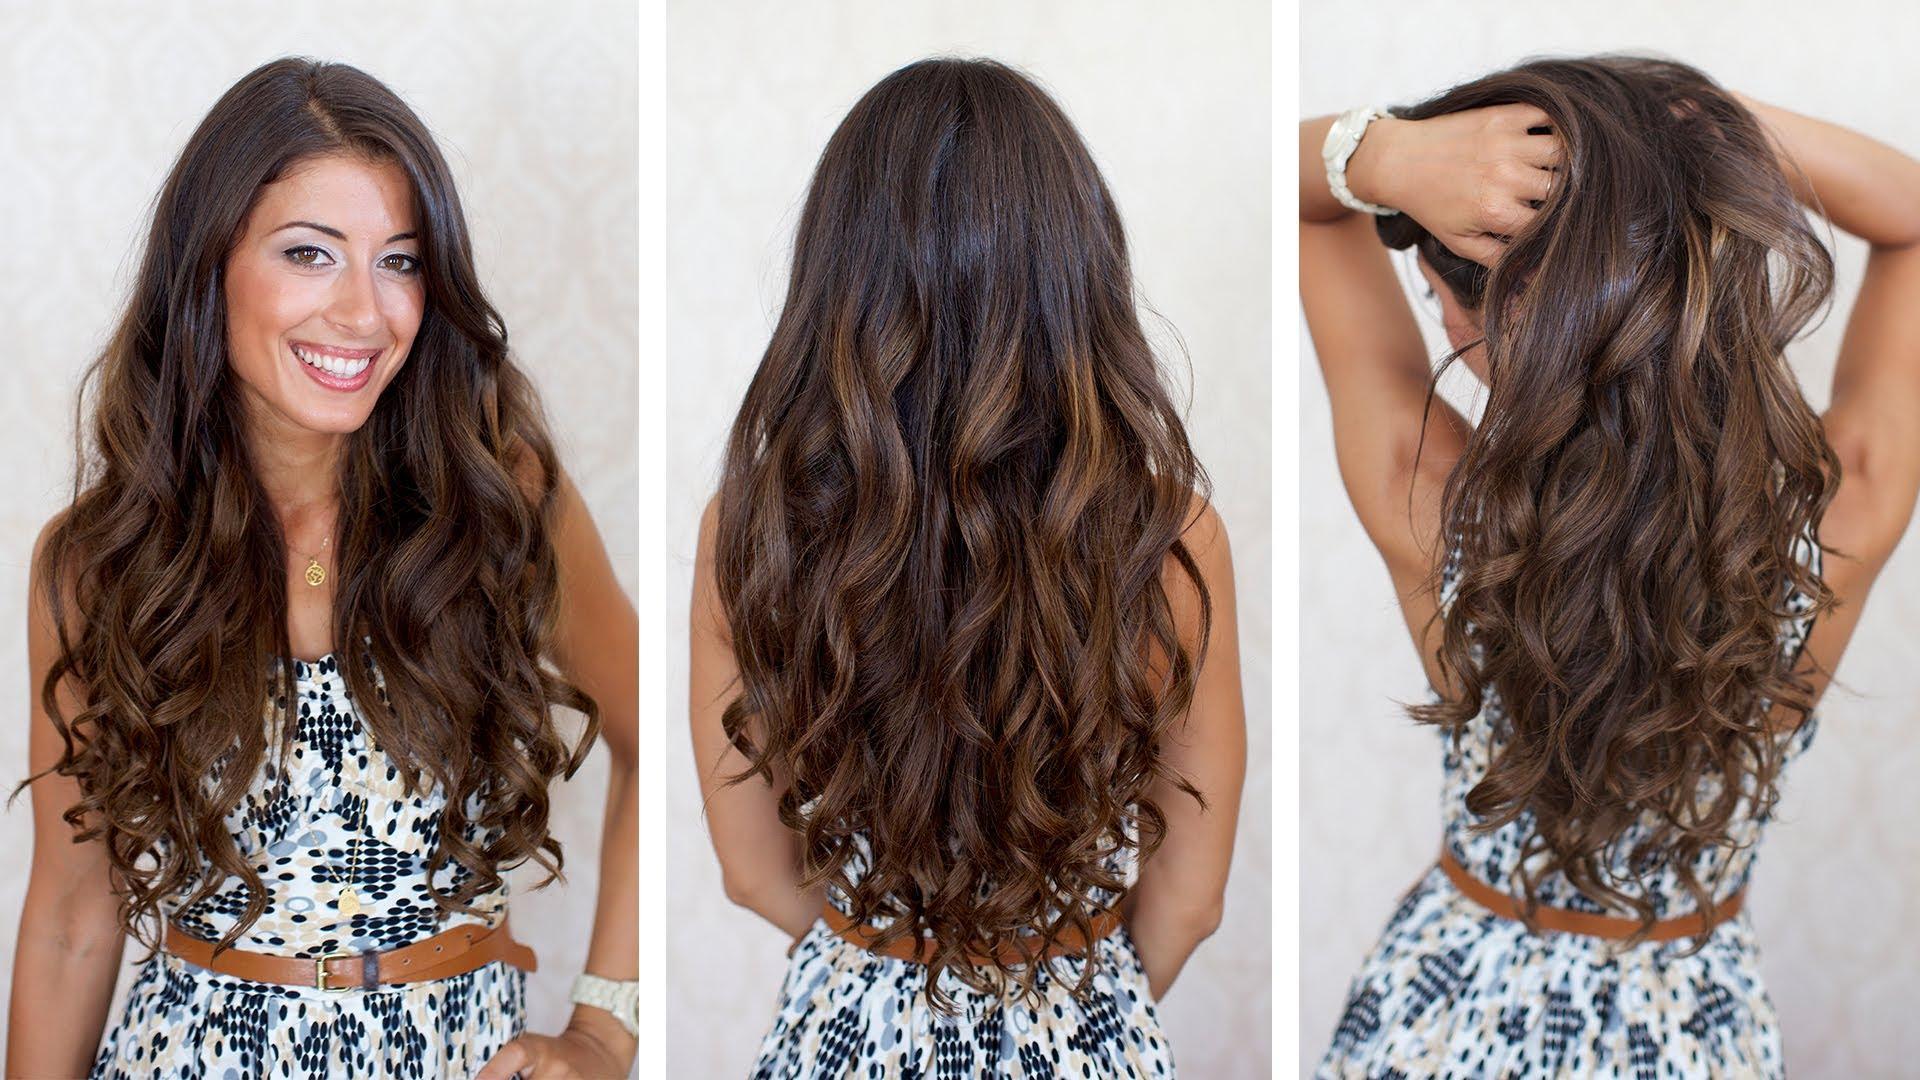 Big Voluminous Curls Hair DIY Fashion Tips | DIY Fashion Projects